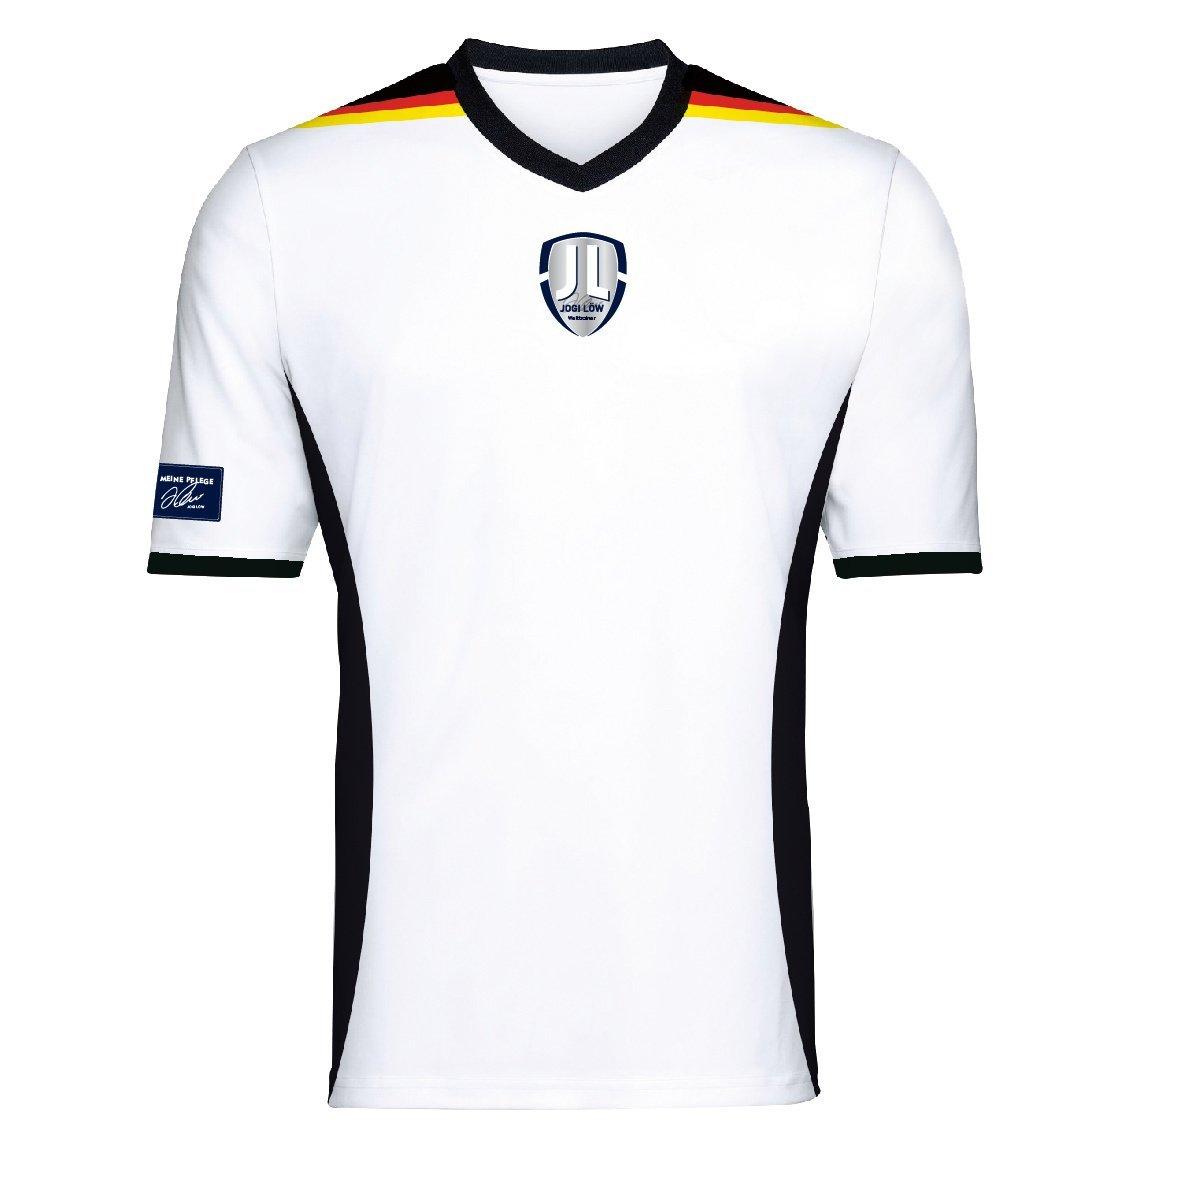 Nivea Men Jogi Shirt, Größe S, 1 Stück: Amazon.de: Beauty